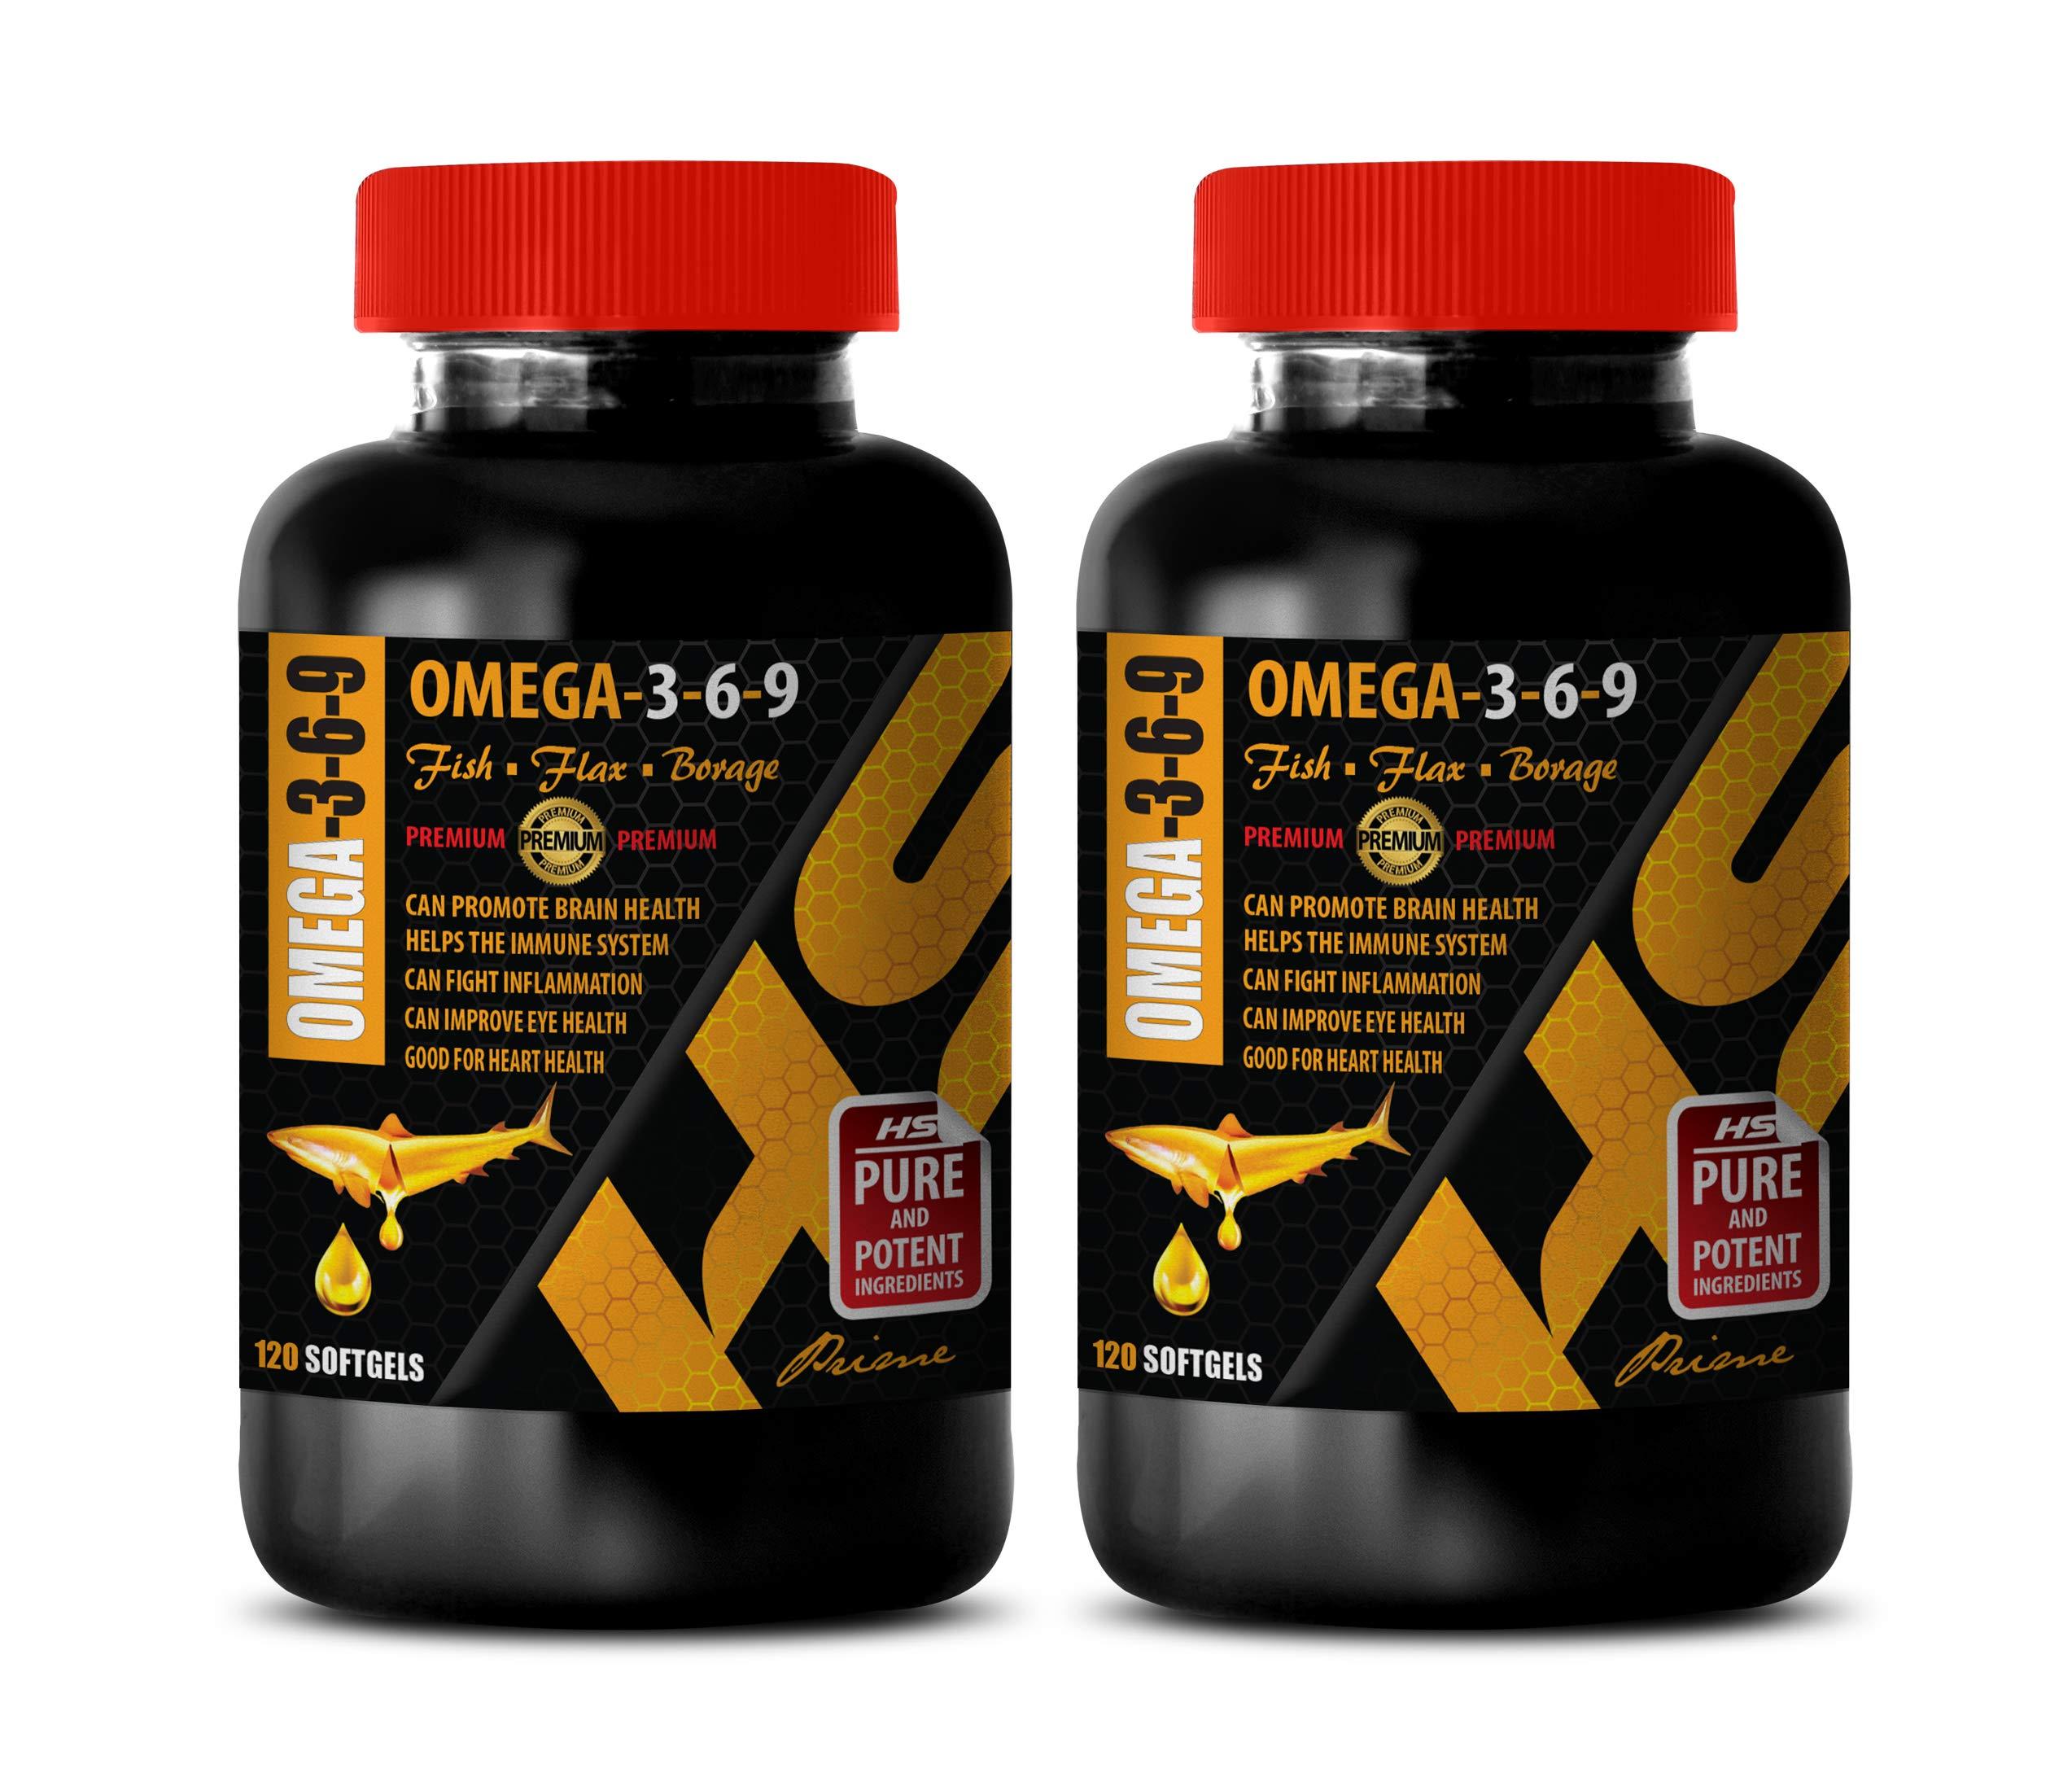 Brain Health Vitamins - Omega 3-6-9 Premium Complex with Fish, Flax & Borage - Omega 3 6 9 Bulk Supplements - 2 Bottles 240 Softgels